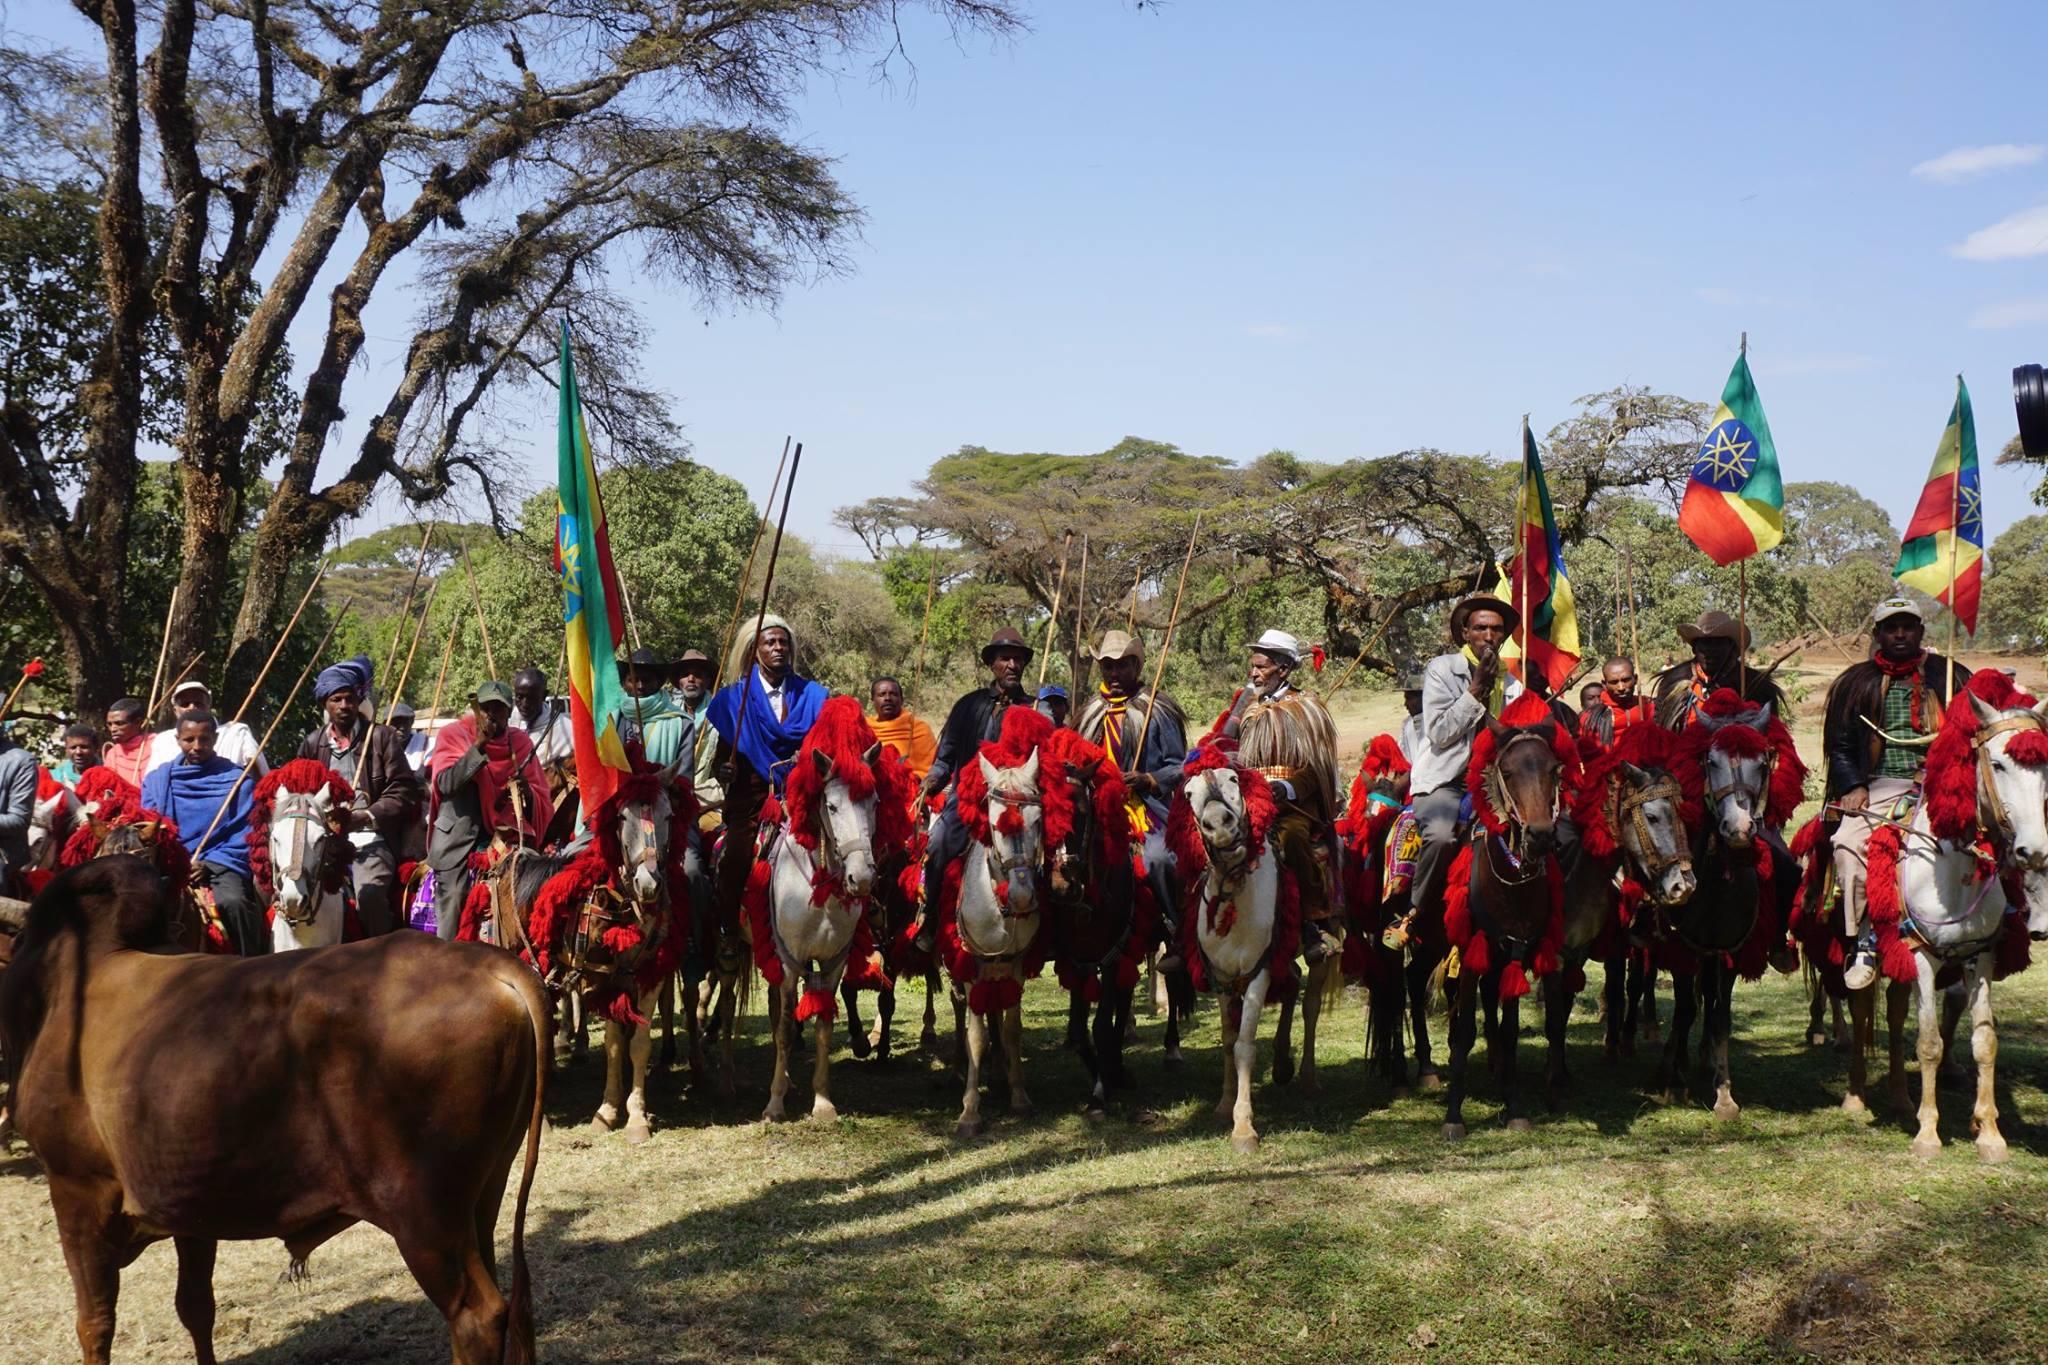 Gimjabet procession